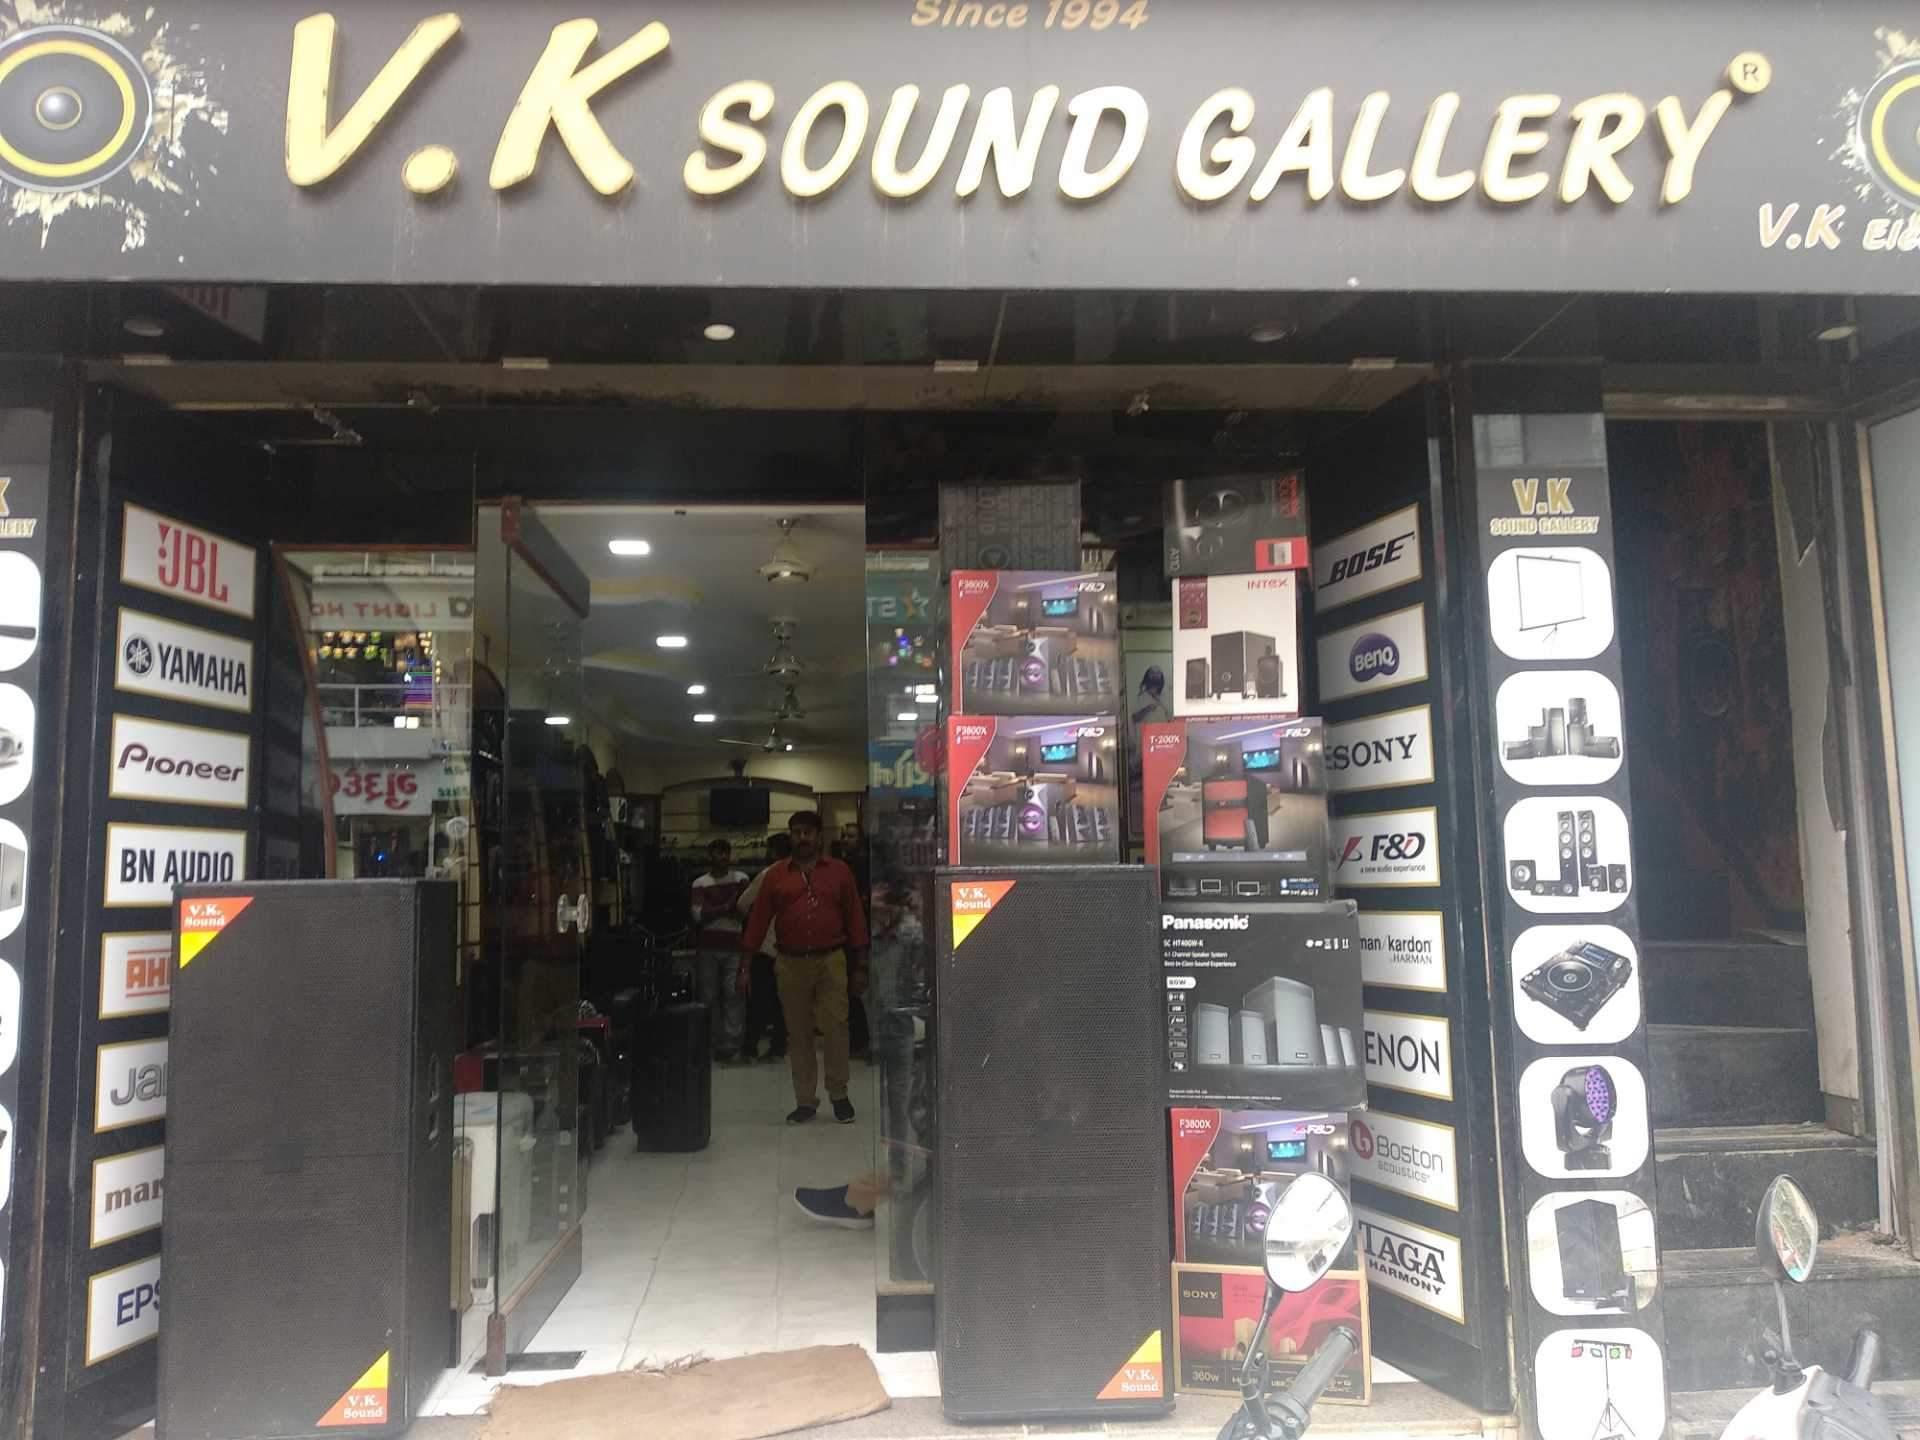 Top 10 Ahuja Amplifier Dealers in Surat - Best Ahuja